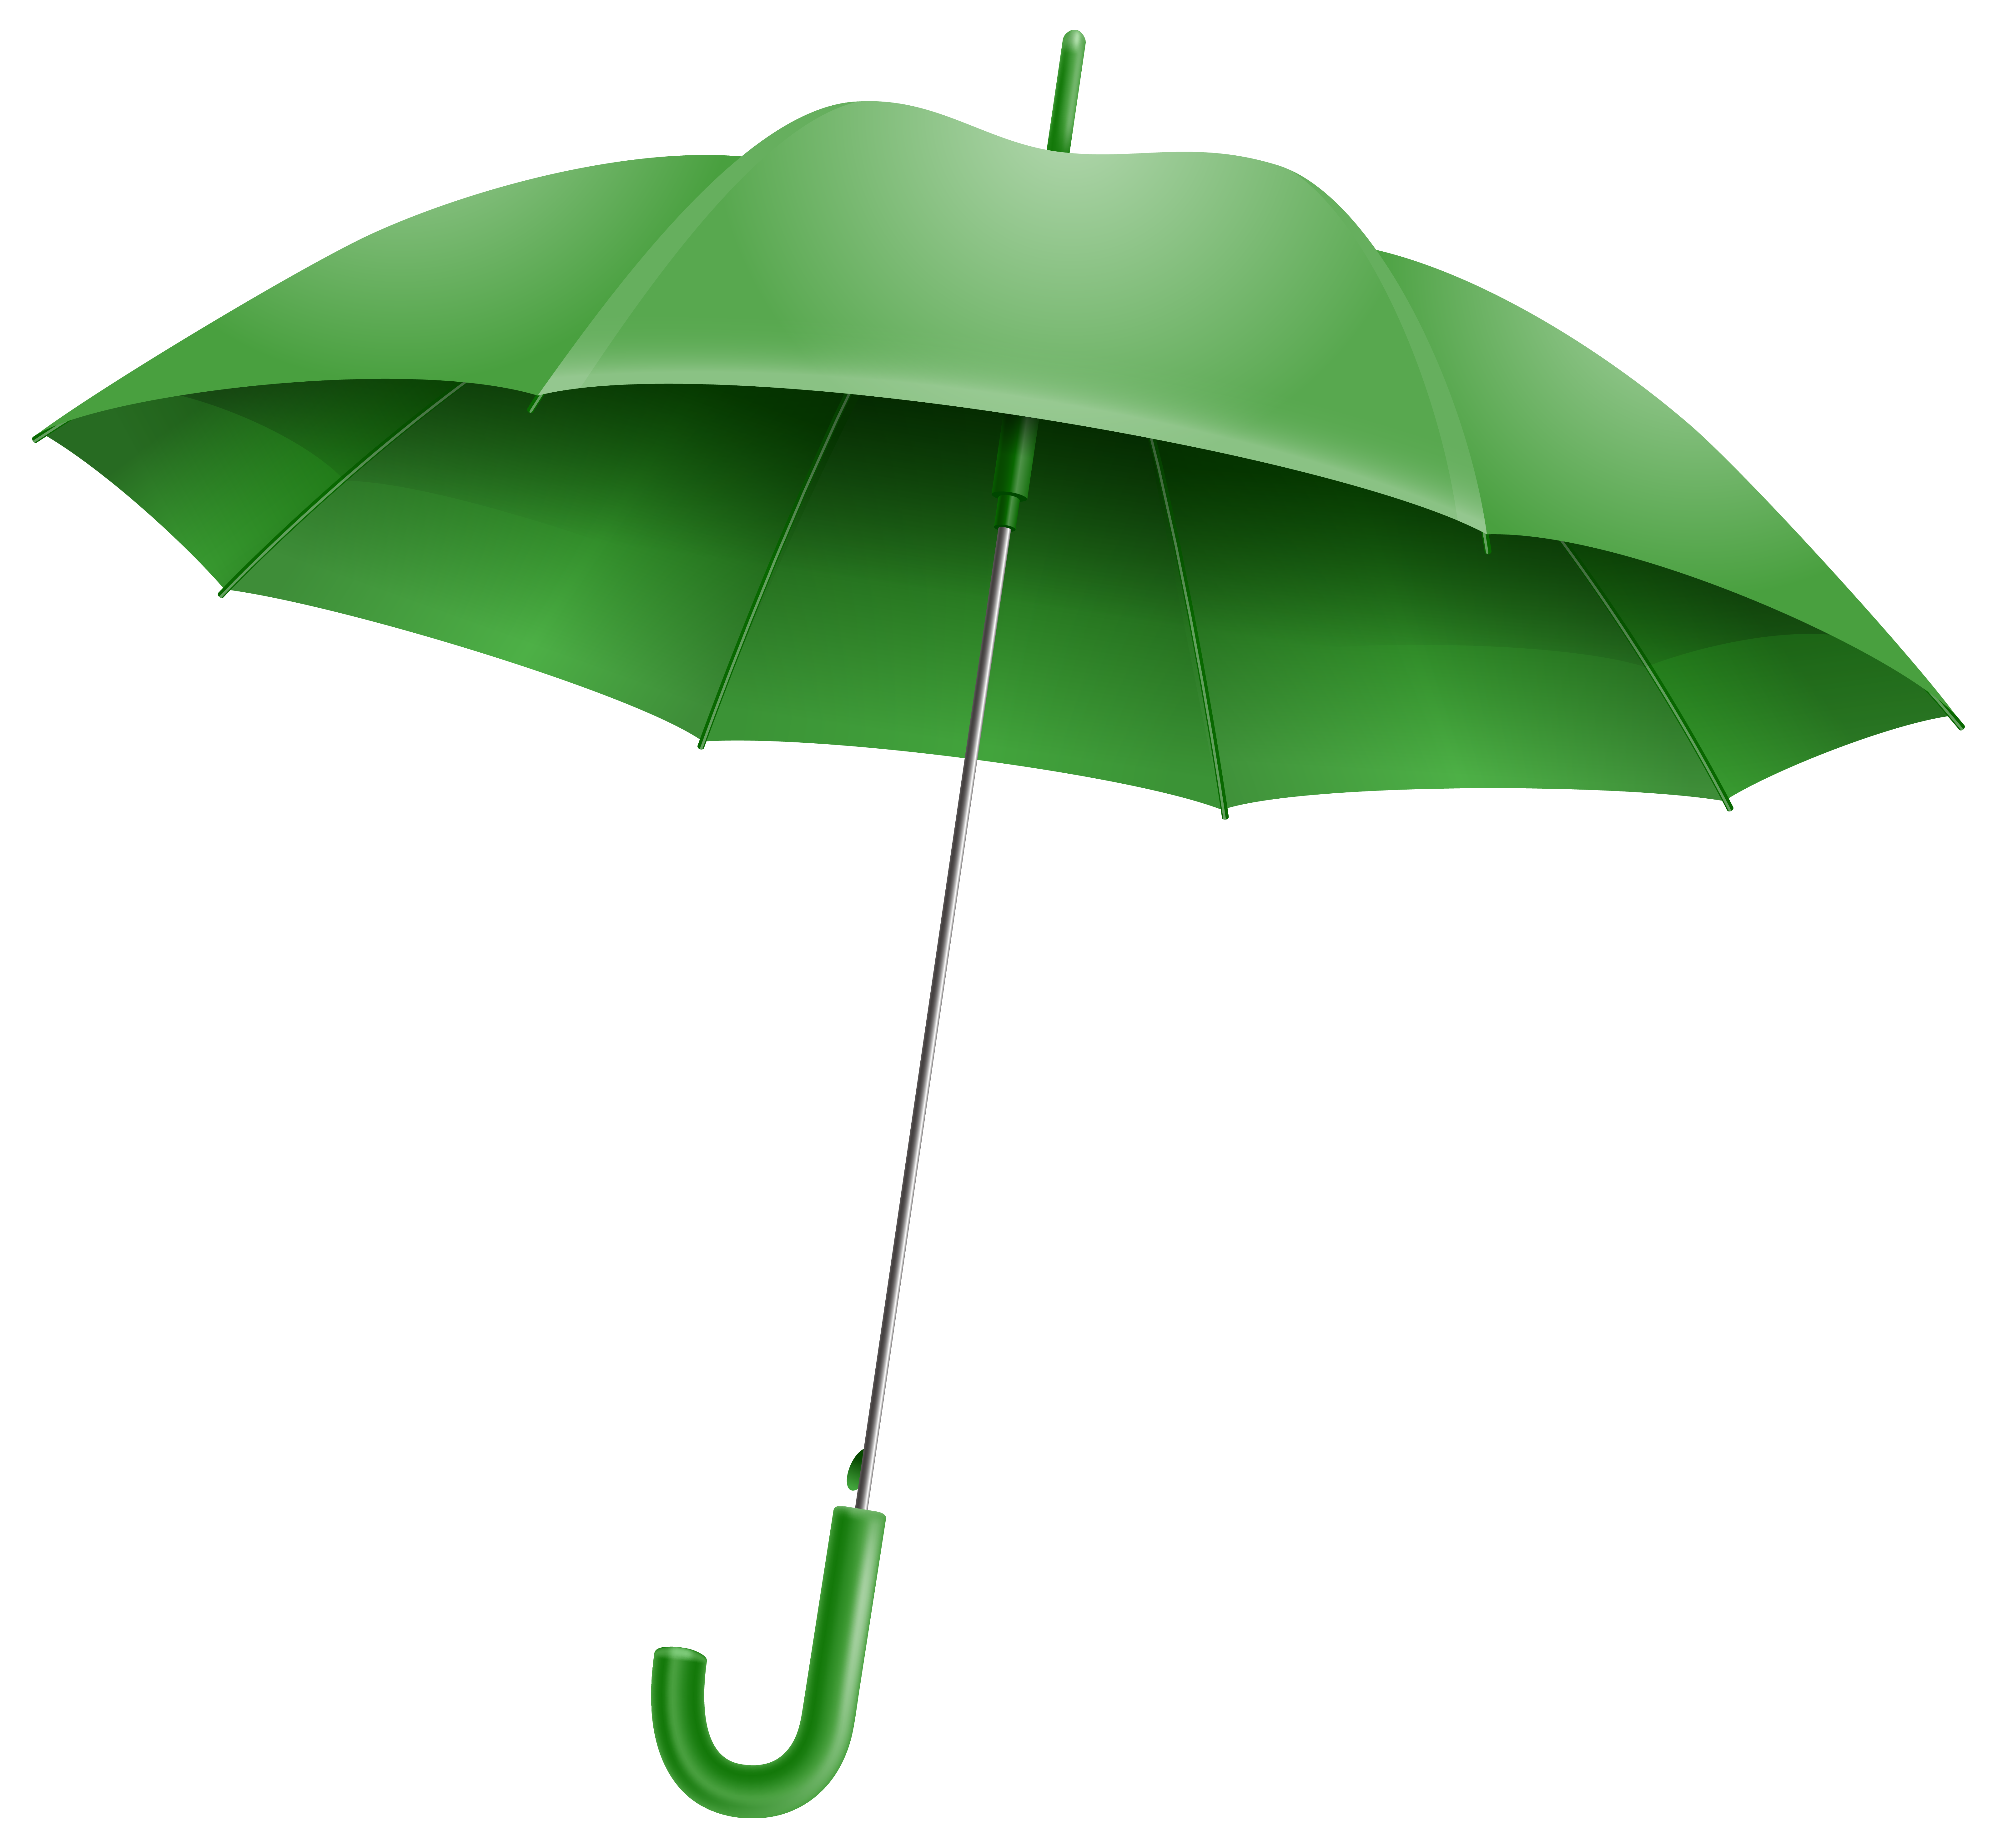 6388x5912 Green Umbrella Png Clipart Imageu200b Gallery Yopriceville